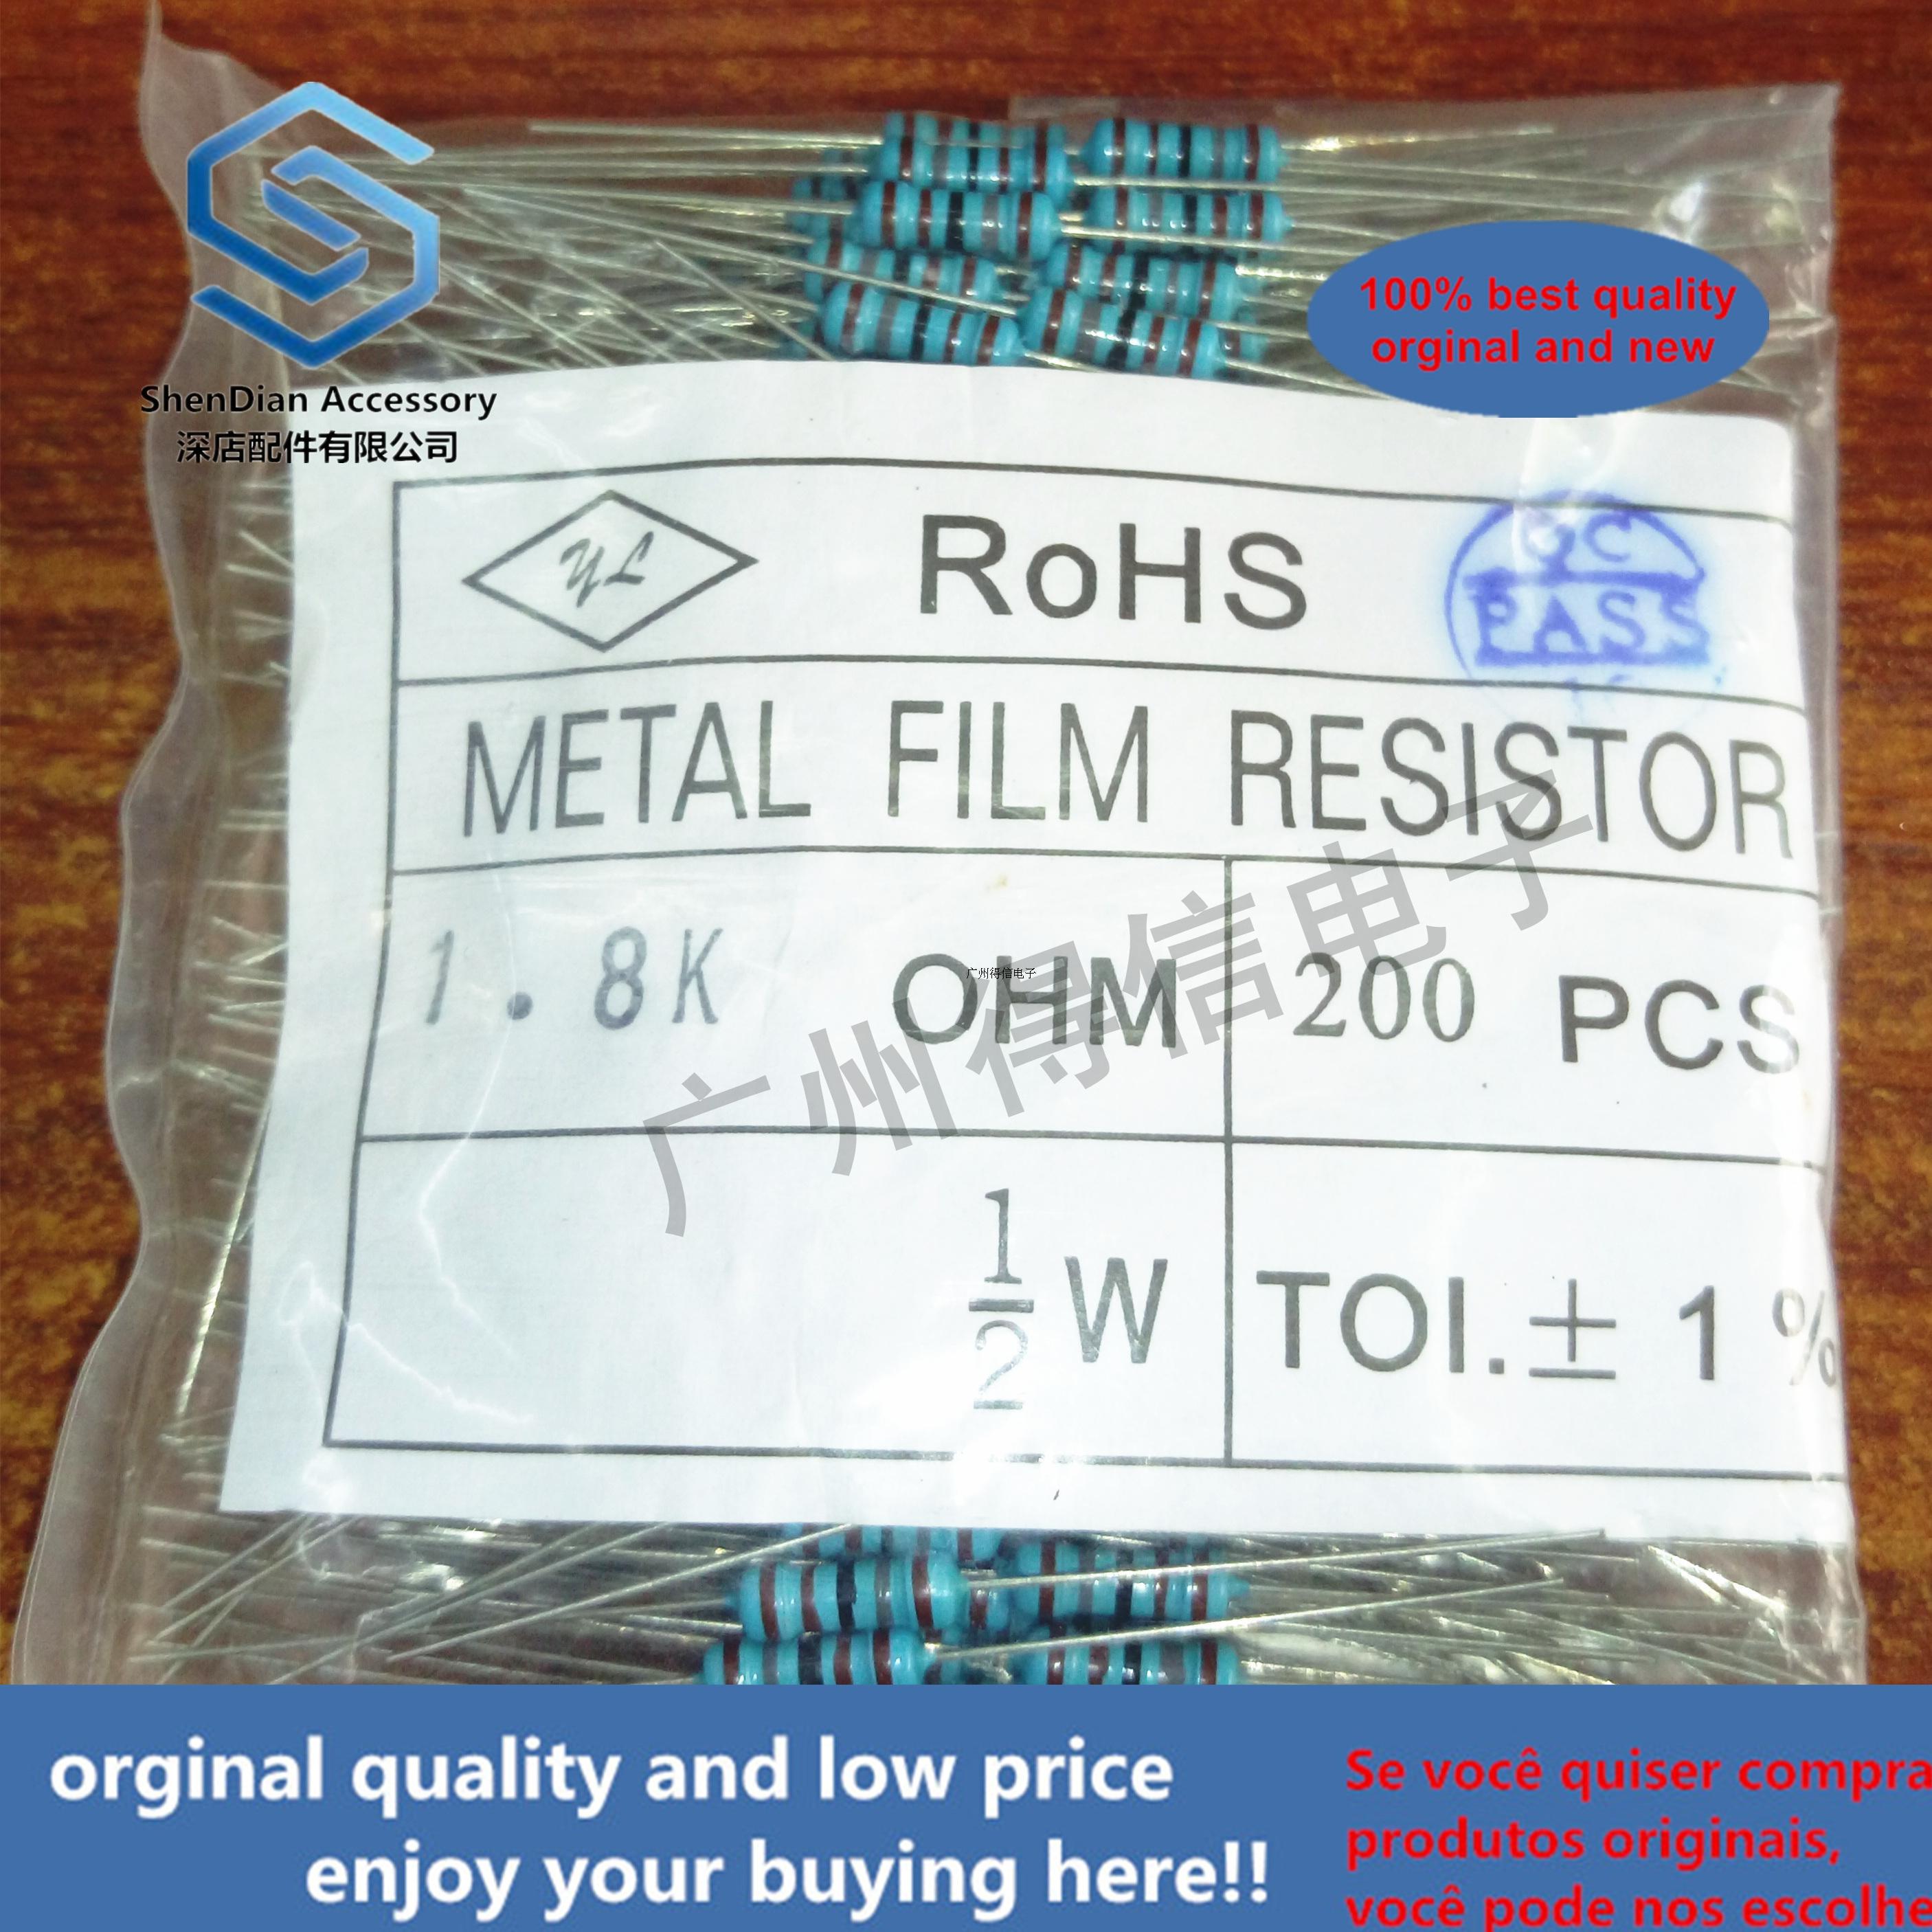 200pcs 1 / 2W 10R 10Euro 1% Brand New Metal Film Iron Feet Resistance Bag 200pcs Per Pack